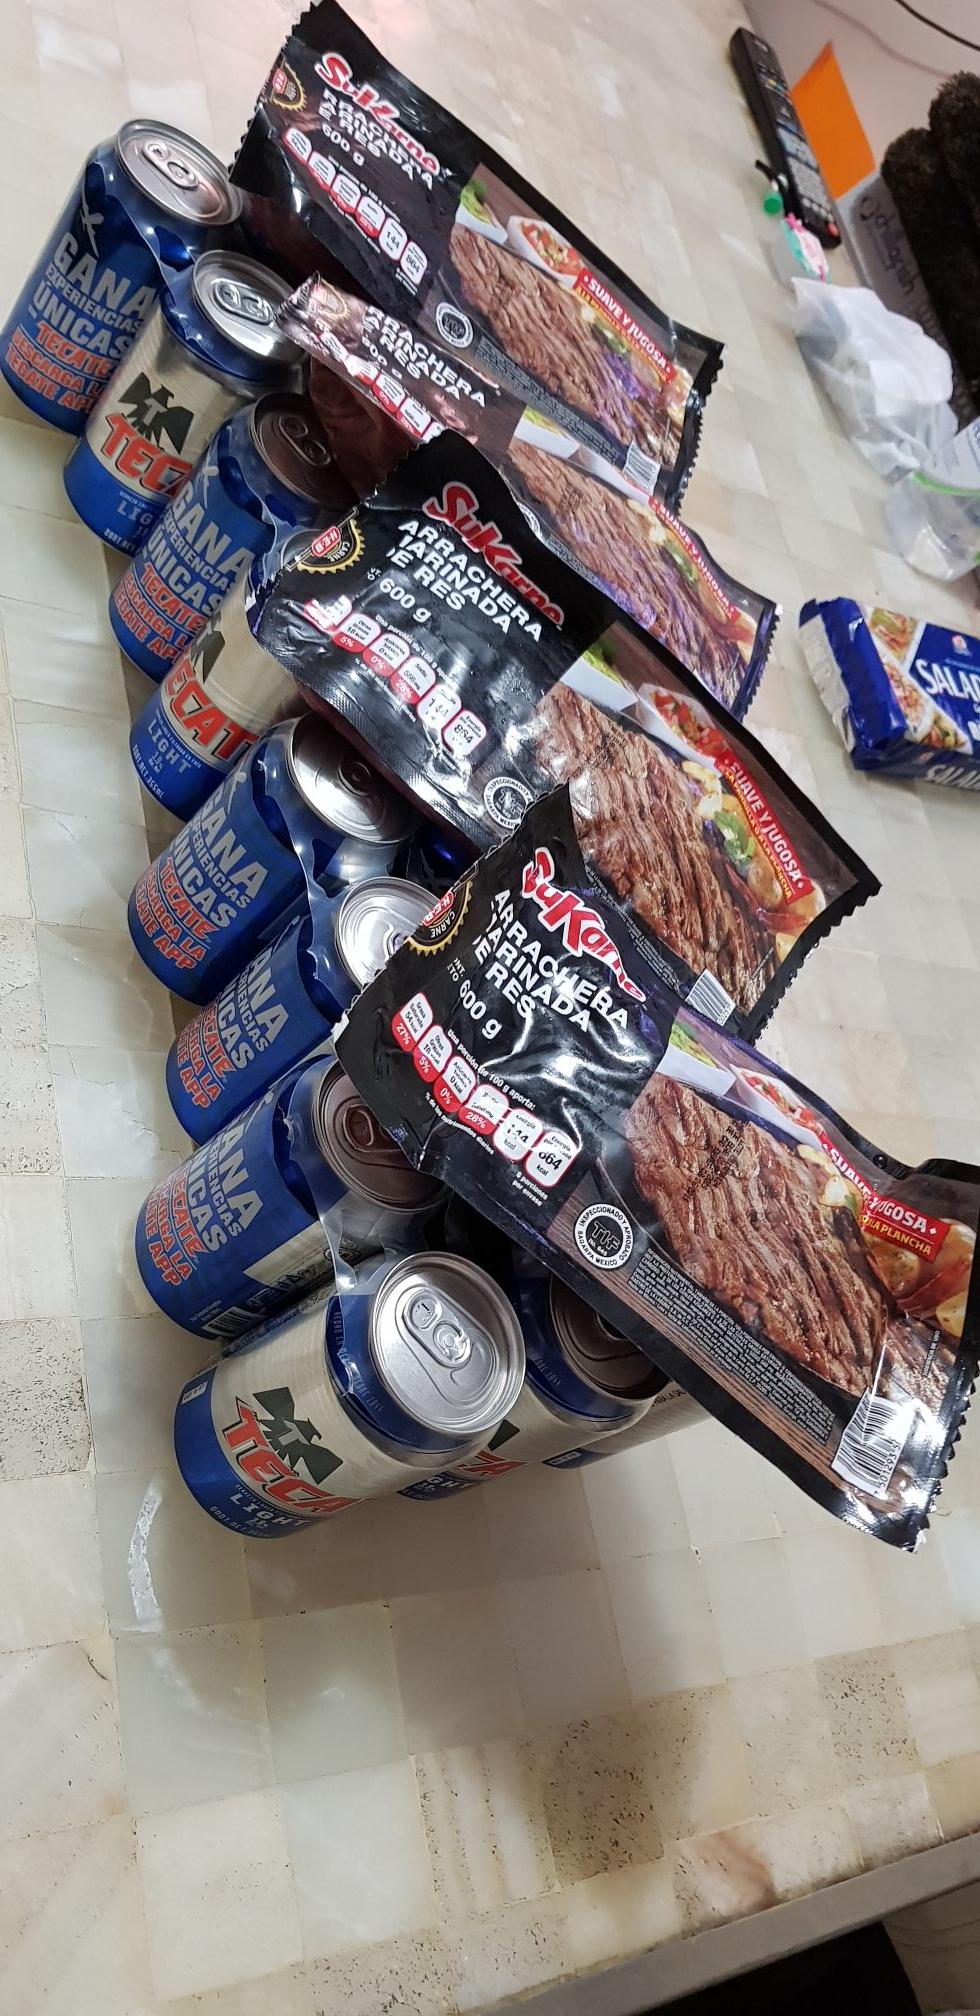 H-E-B Arracherra y six de cerveaza